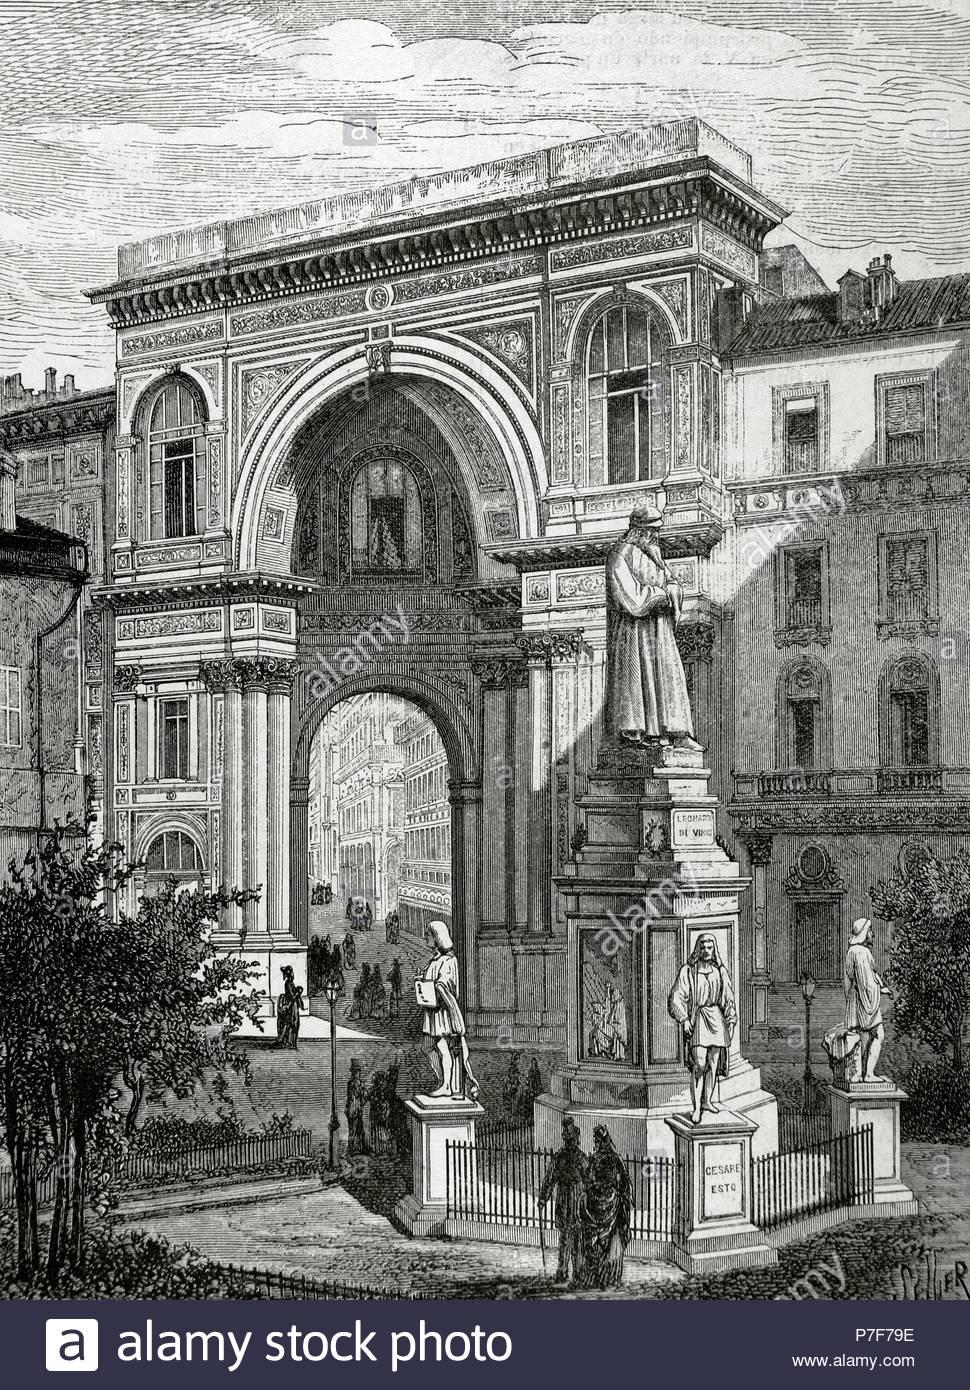 Leonardo da Vinci (1452-1519). Italian polymath known for his works ...